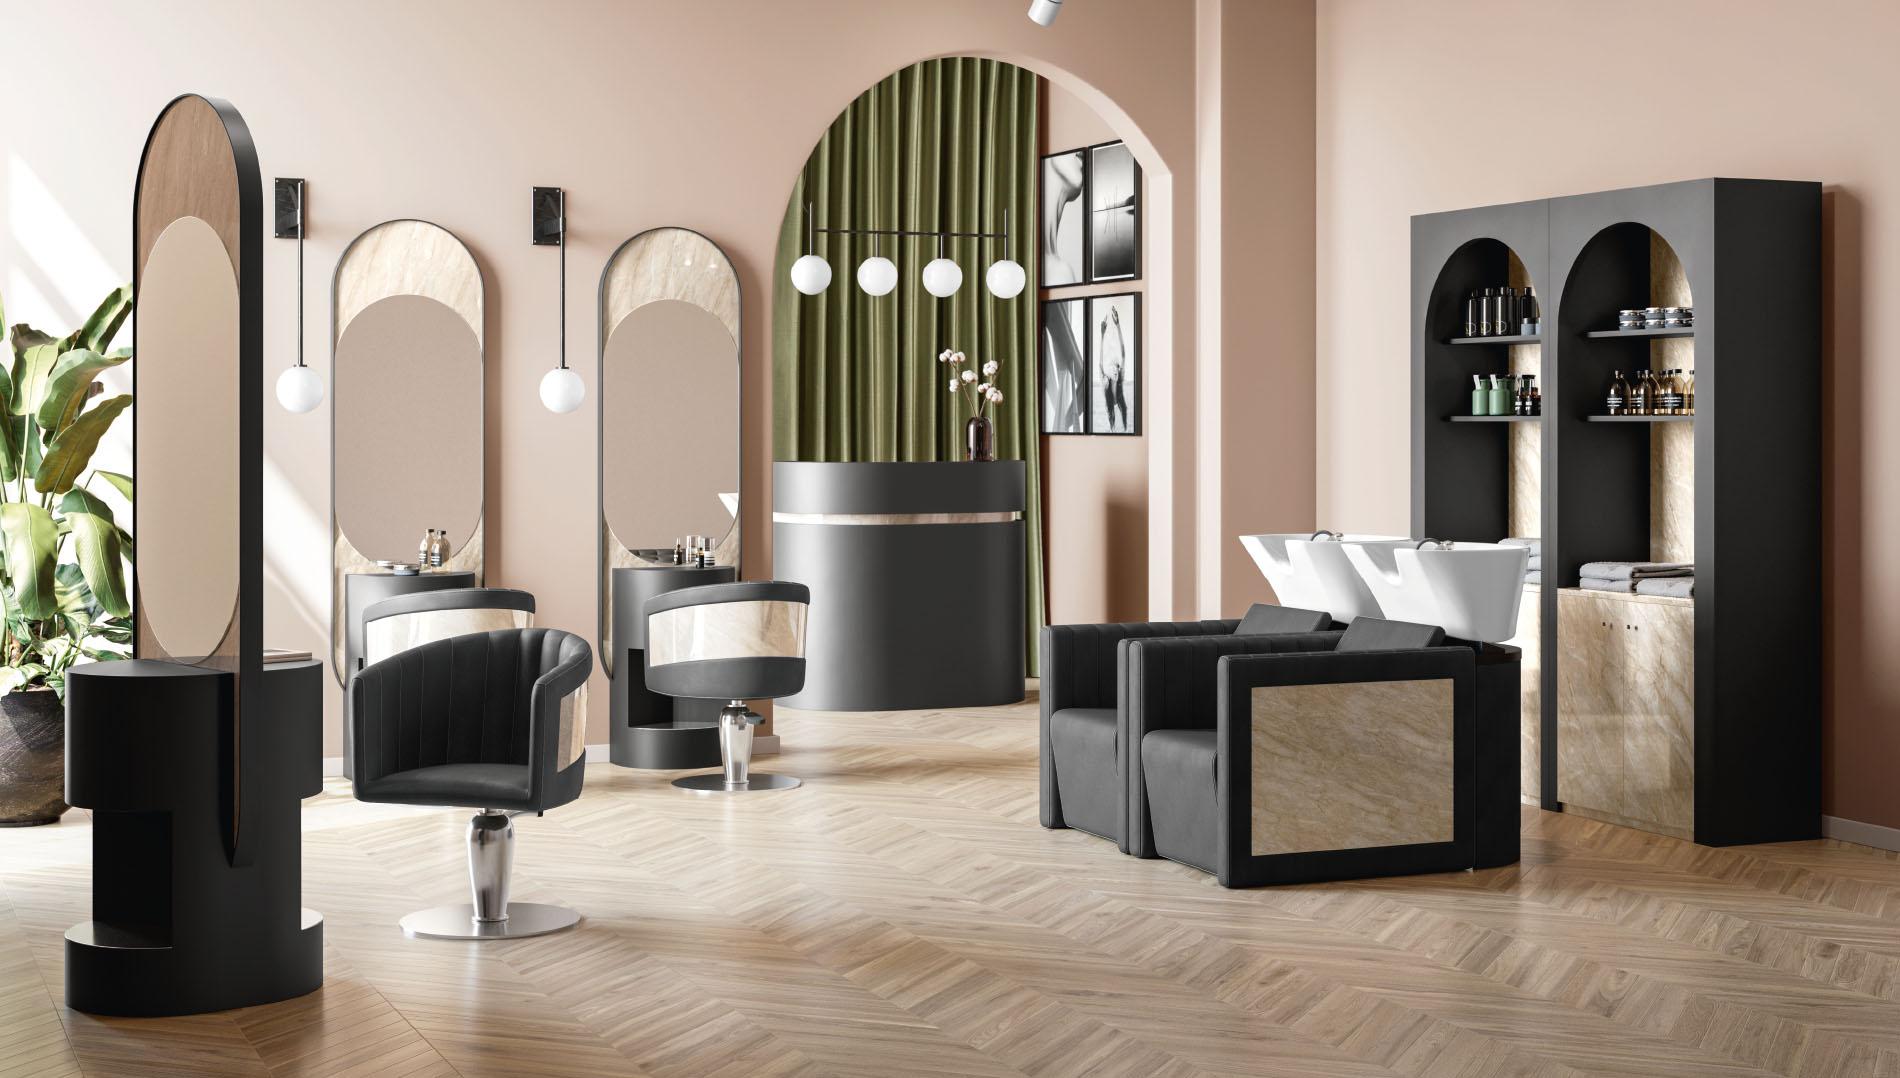 Idee-salone-parrucchiere